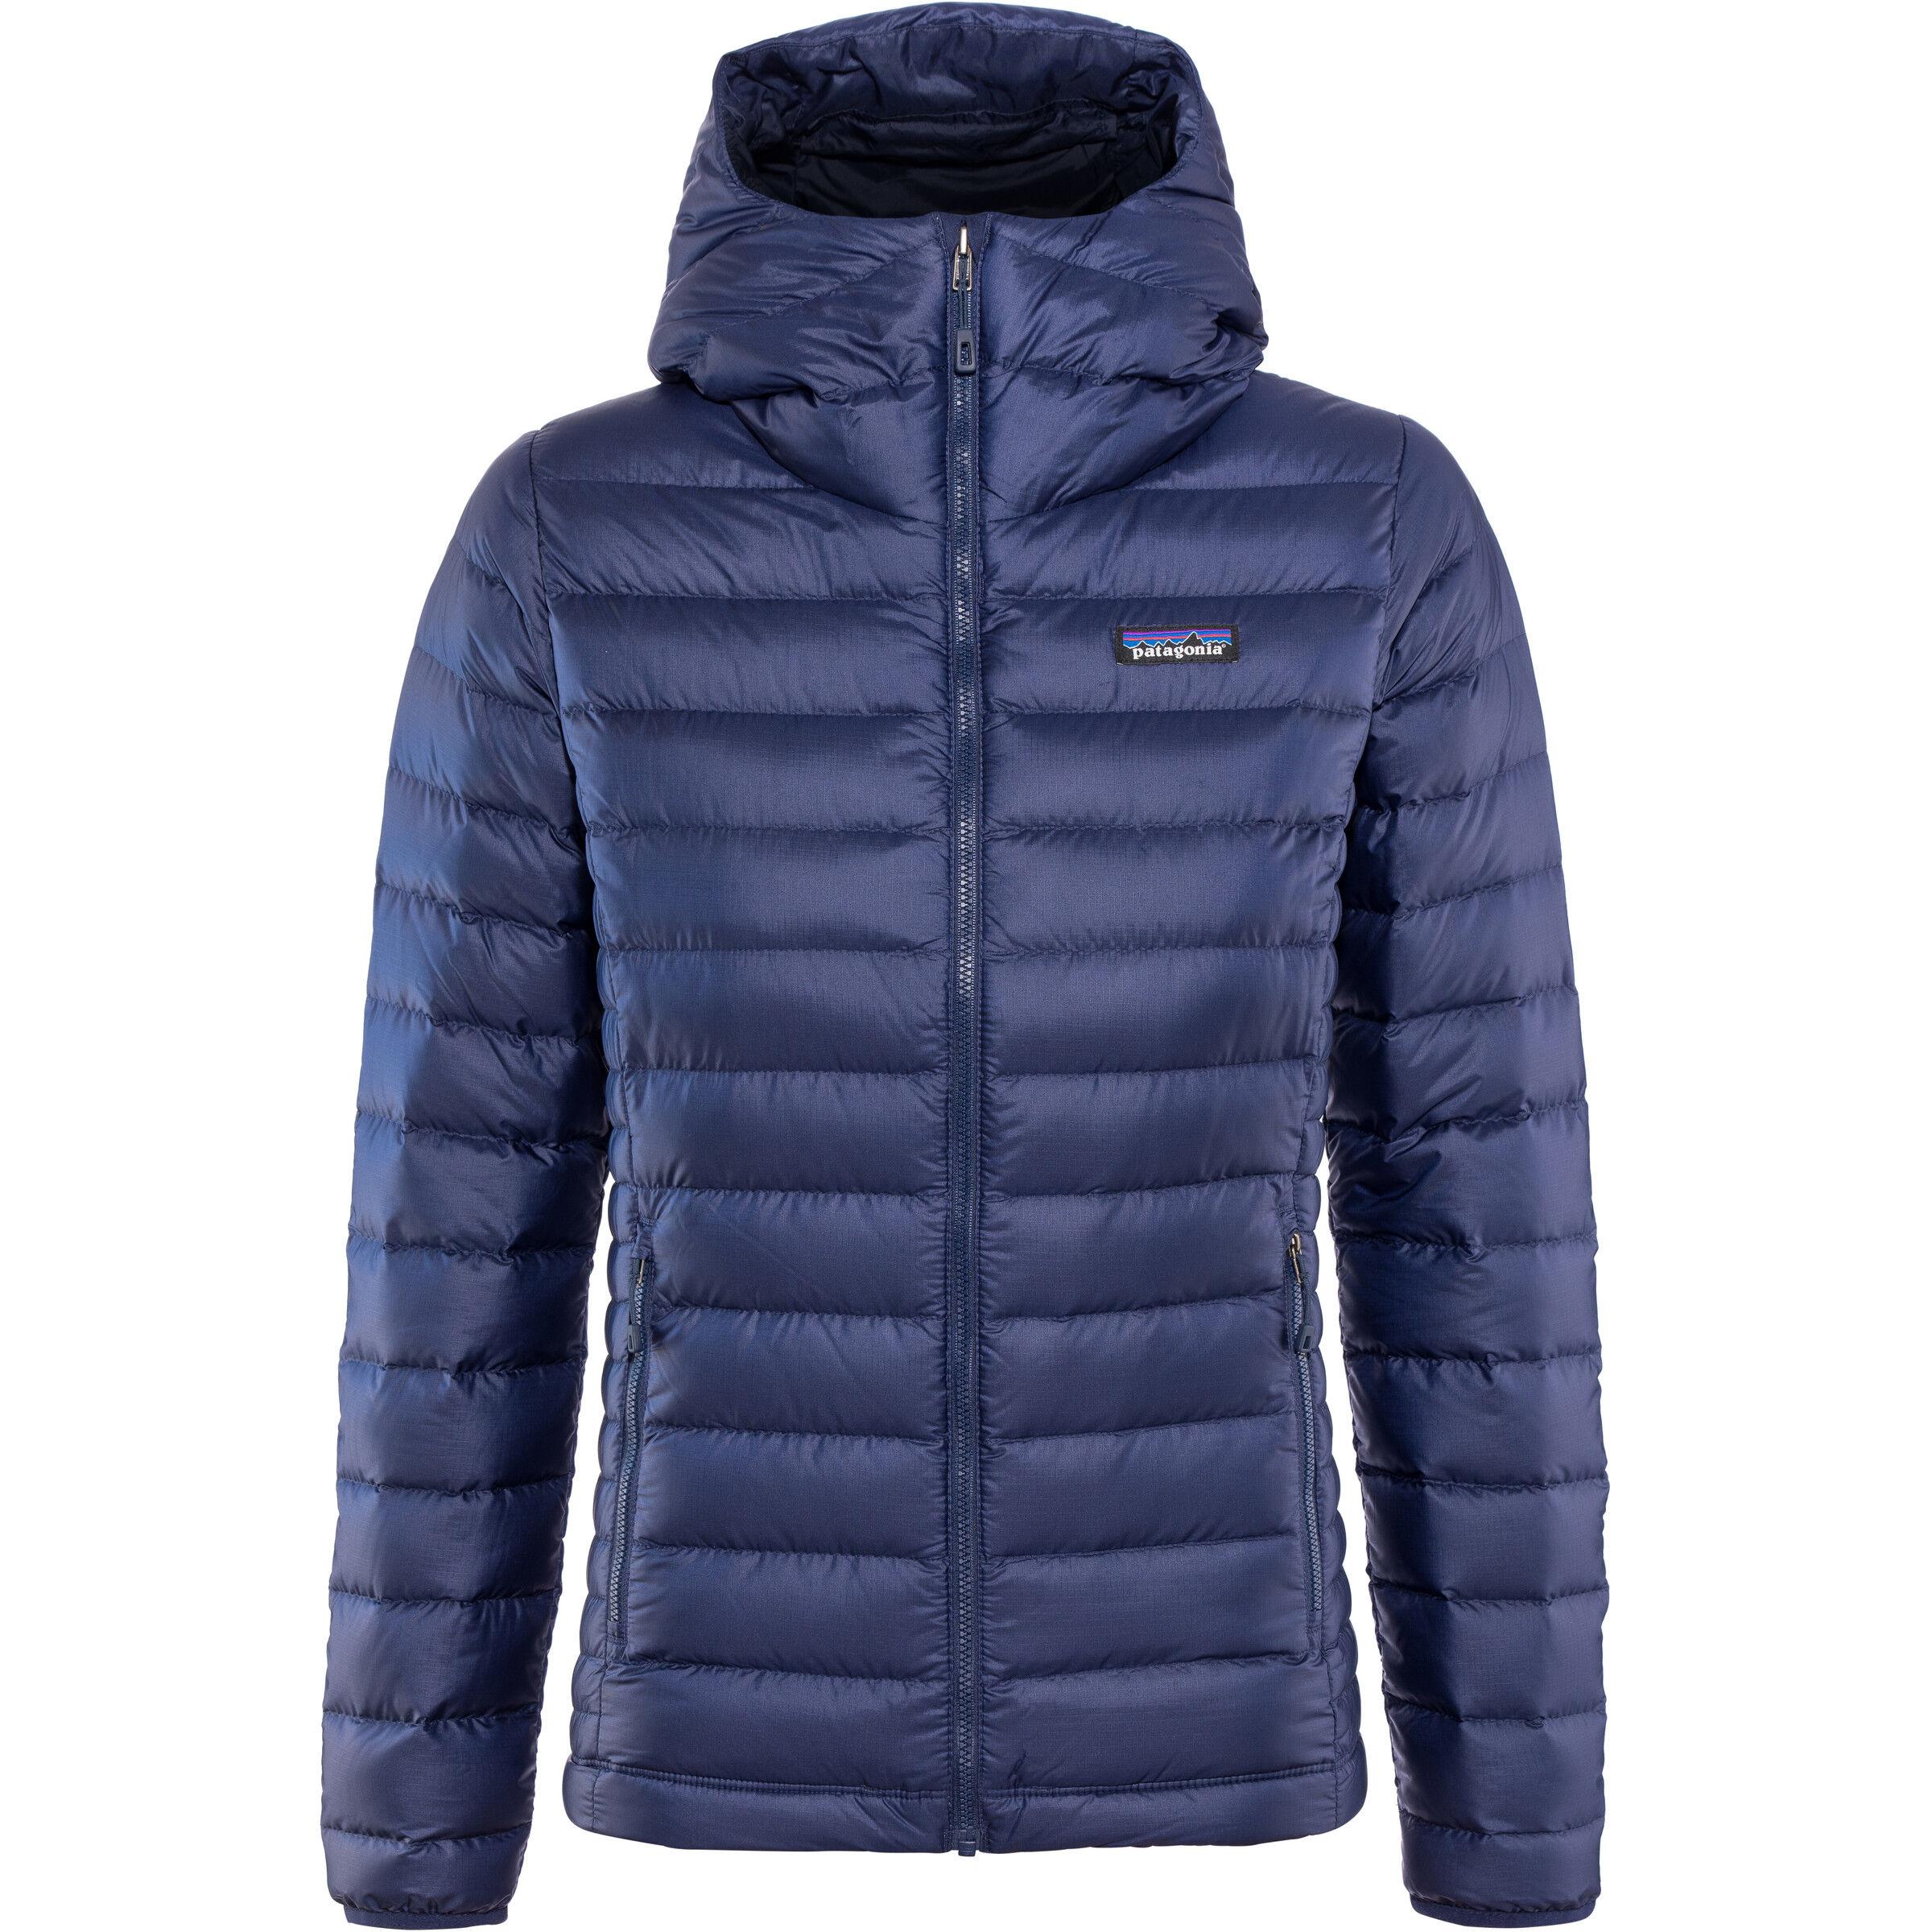 Online Kaufen Winterjacke Günstig Patagonia Daunenjackeamp; rdxWBCoe